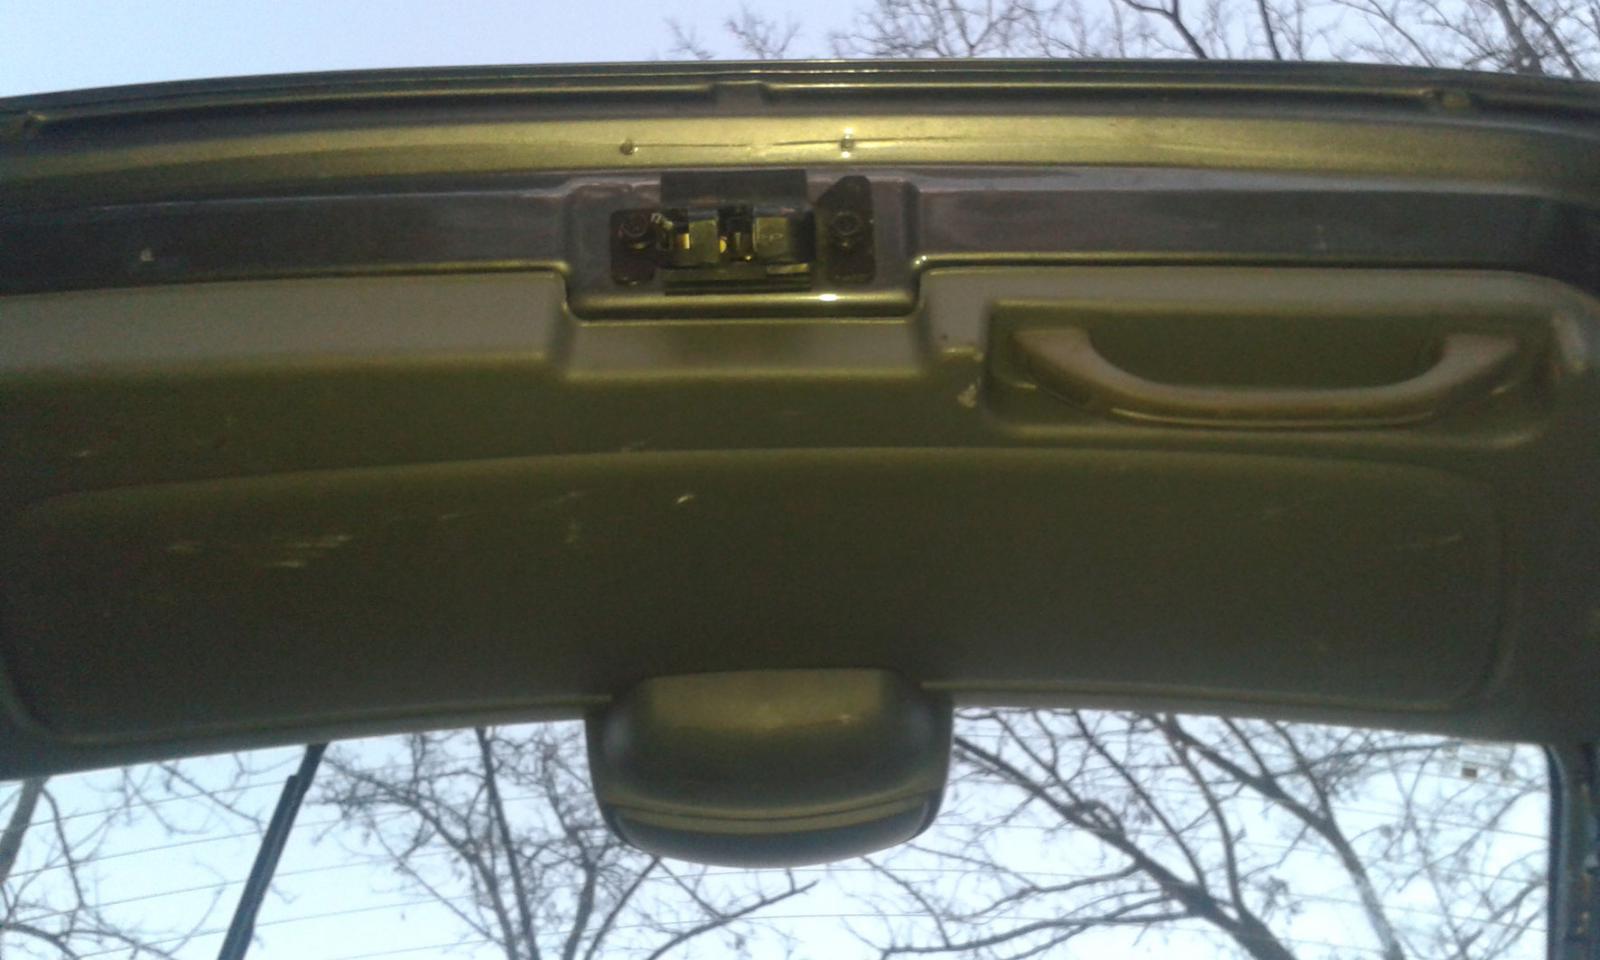 Kia Optima: Rear window defroster